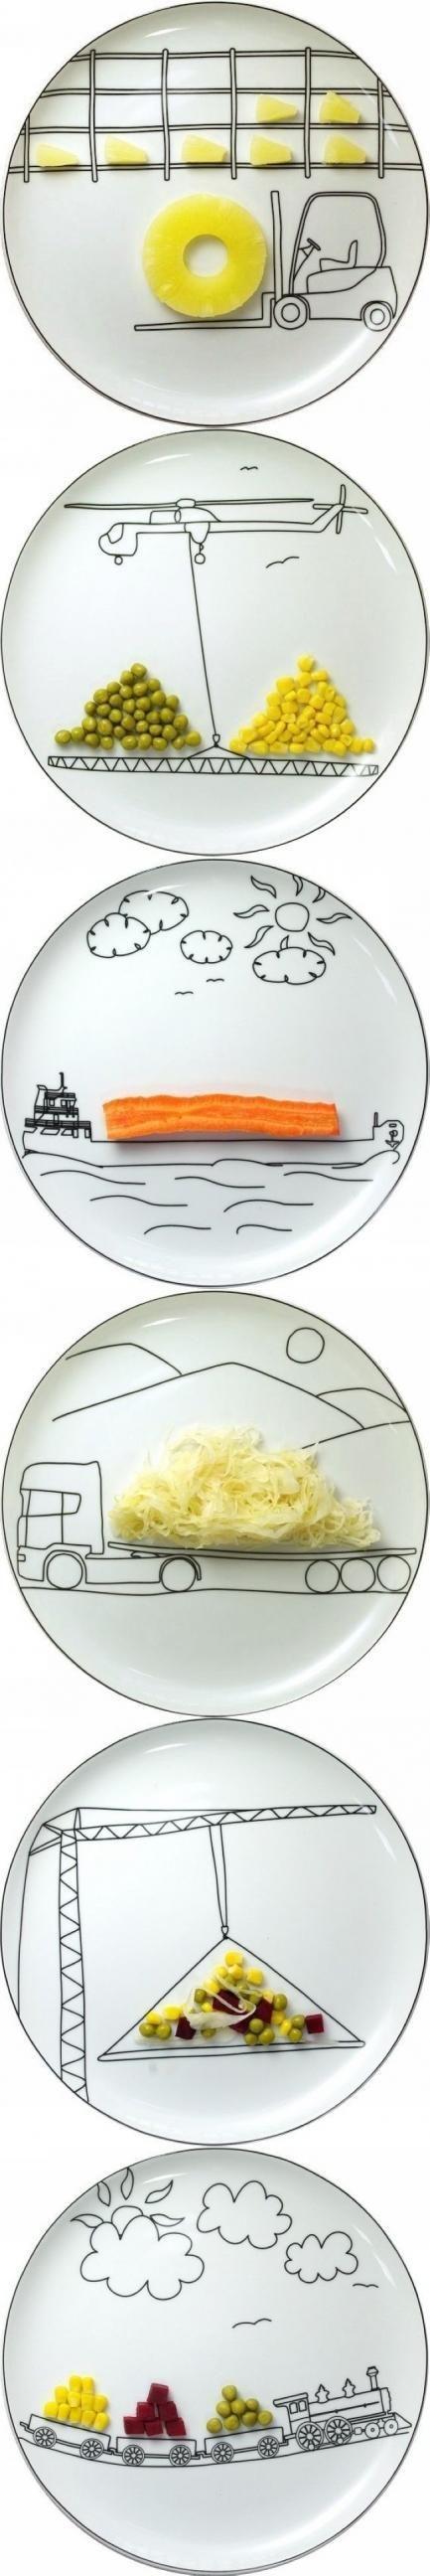 Transportation Plates by Boguslaw Sliwinski, http://www.besign.eu/ #Plates #Play #Boguslaw_Sliwinski